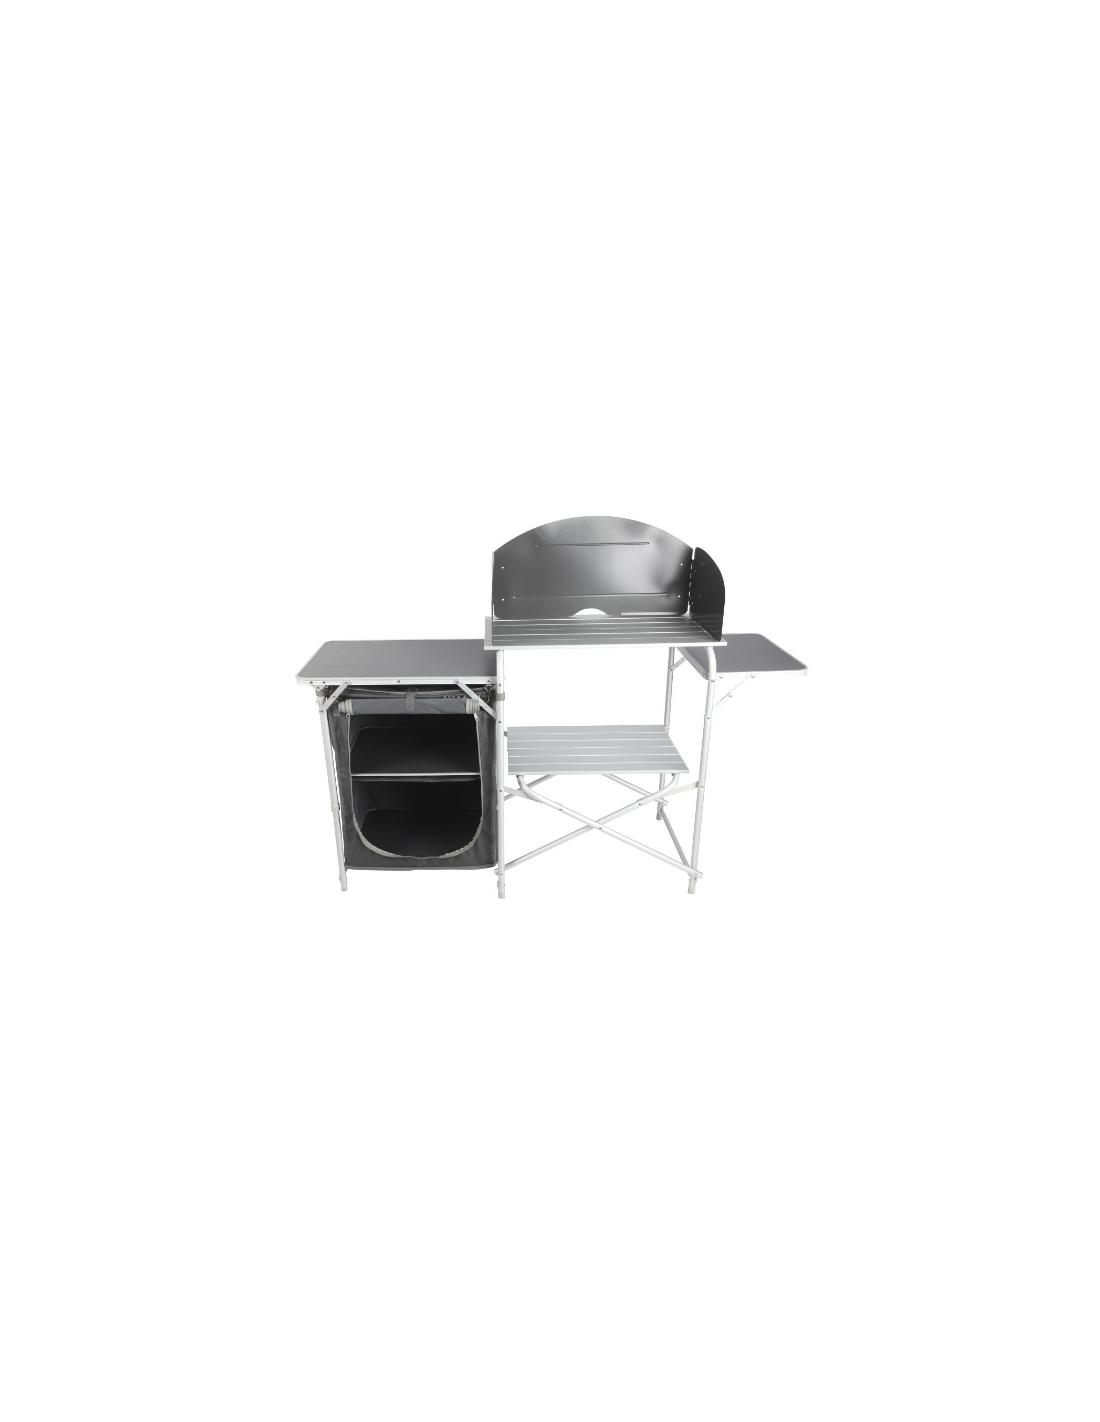 Mueble cocina aluminio midland cuisine egena totalmente for Muebles cocina online